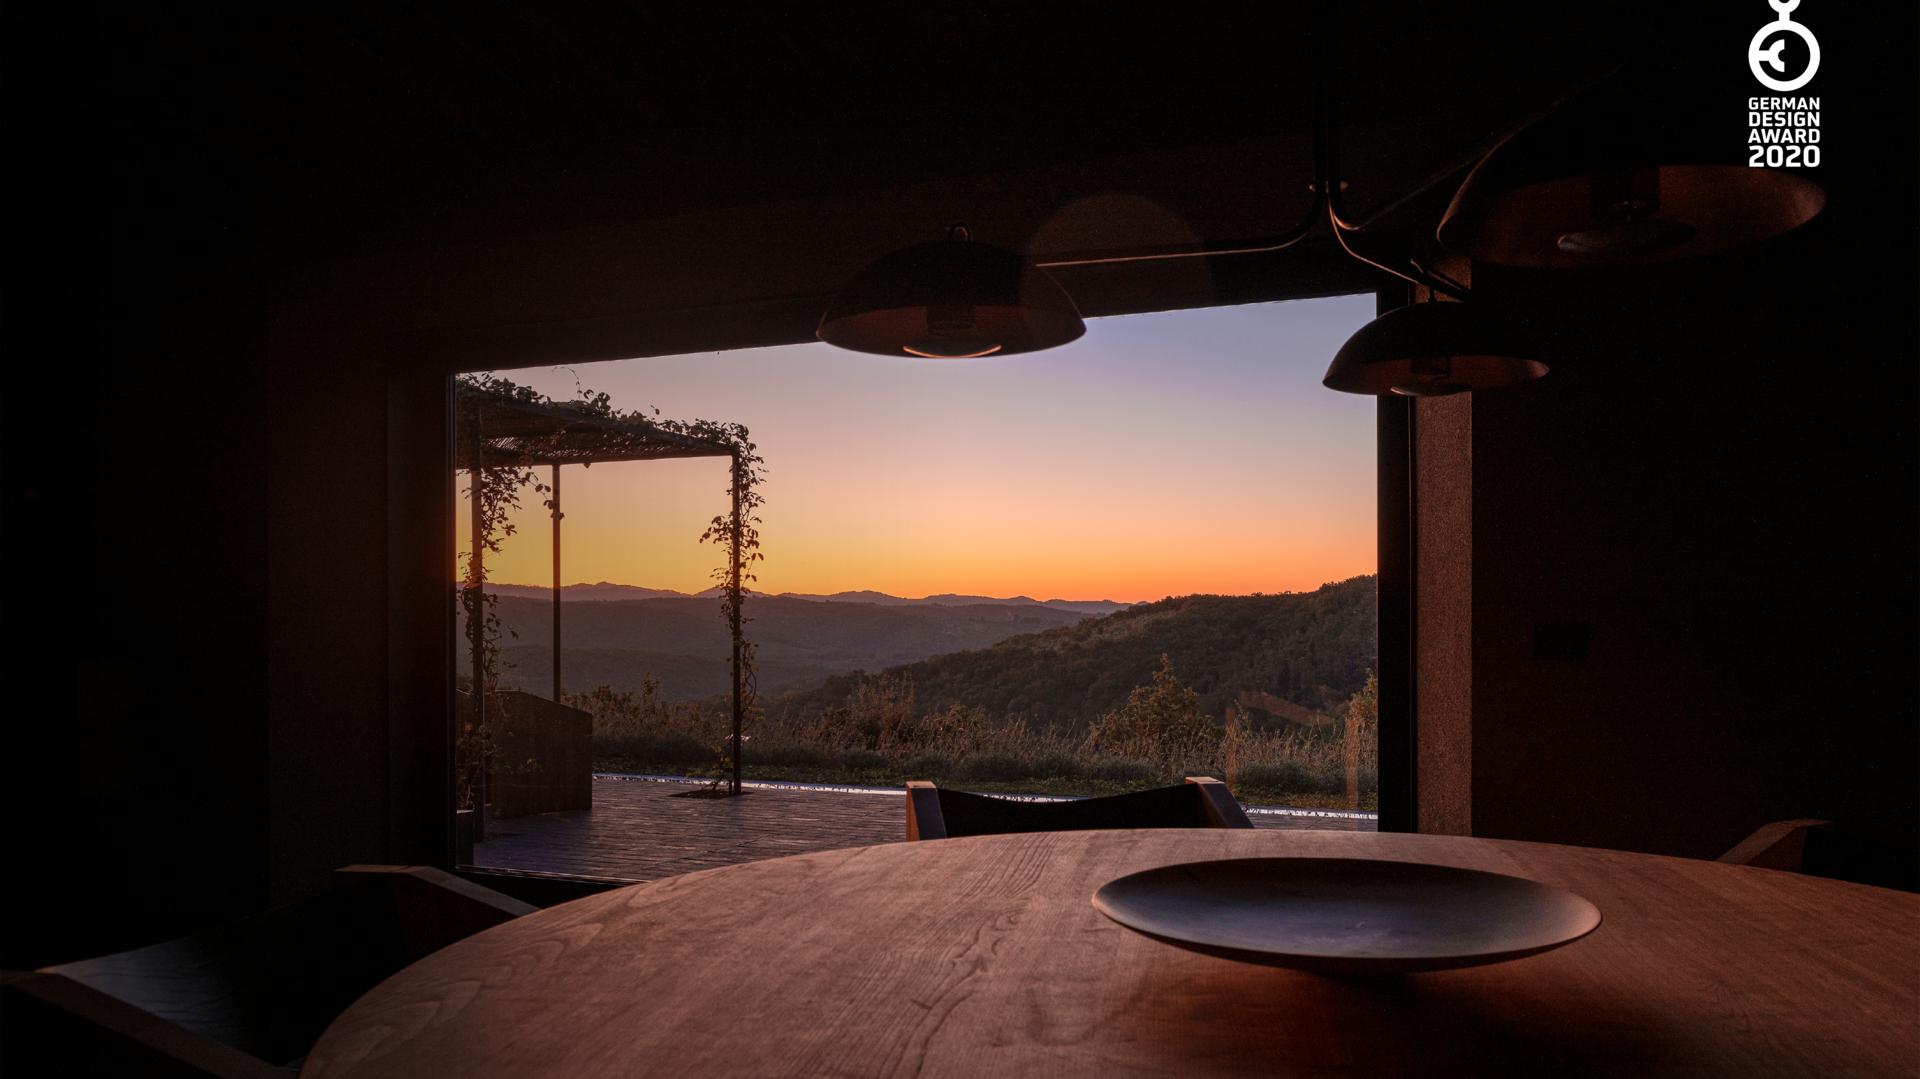 Casa Morelli — German Design Award 2020